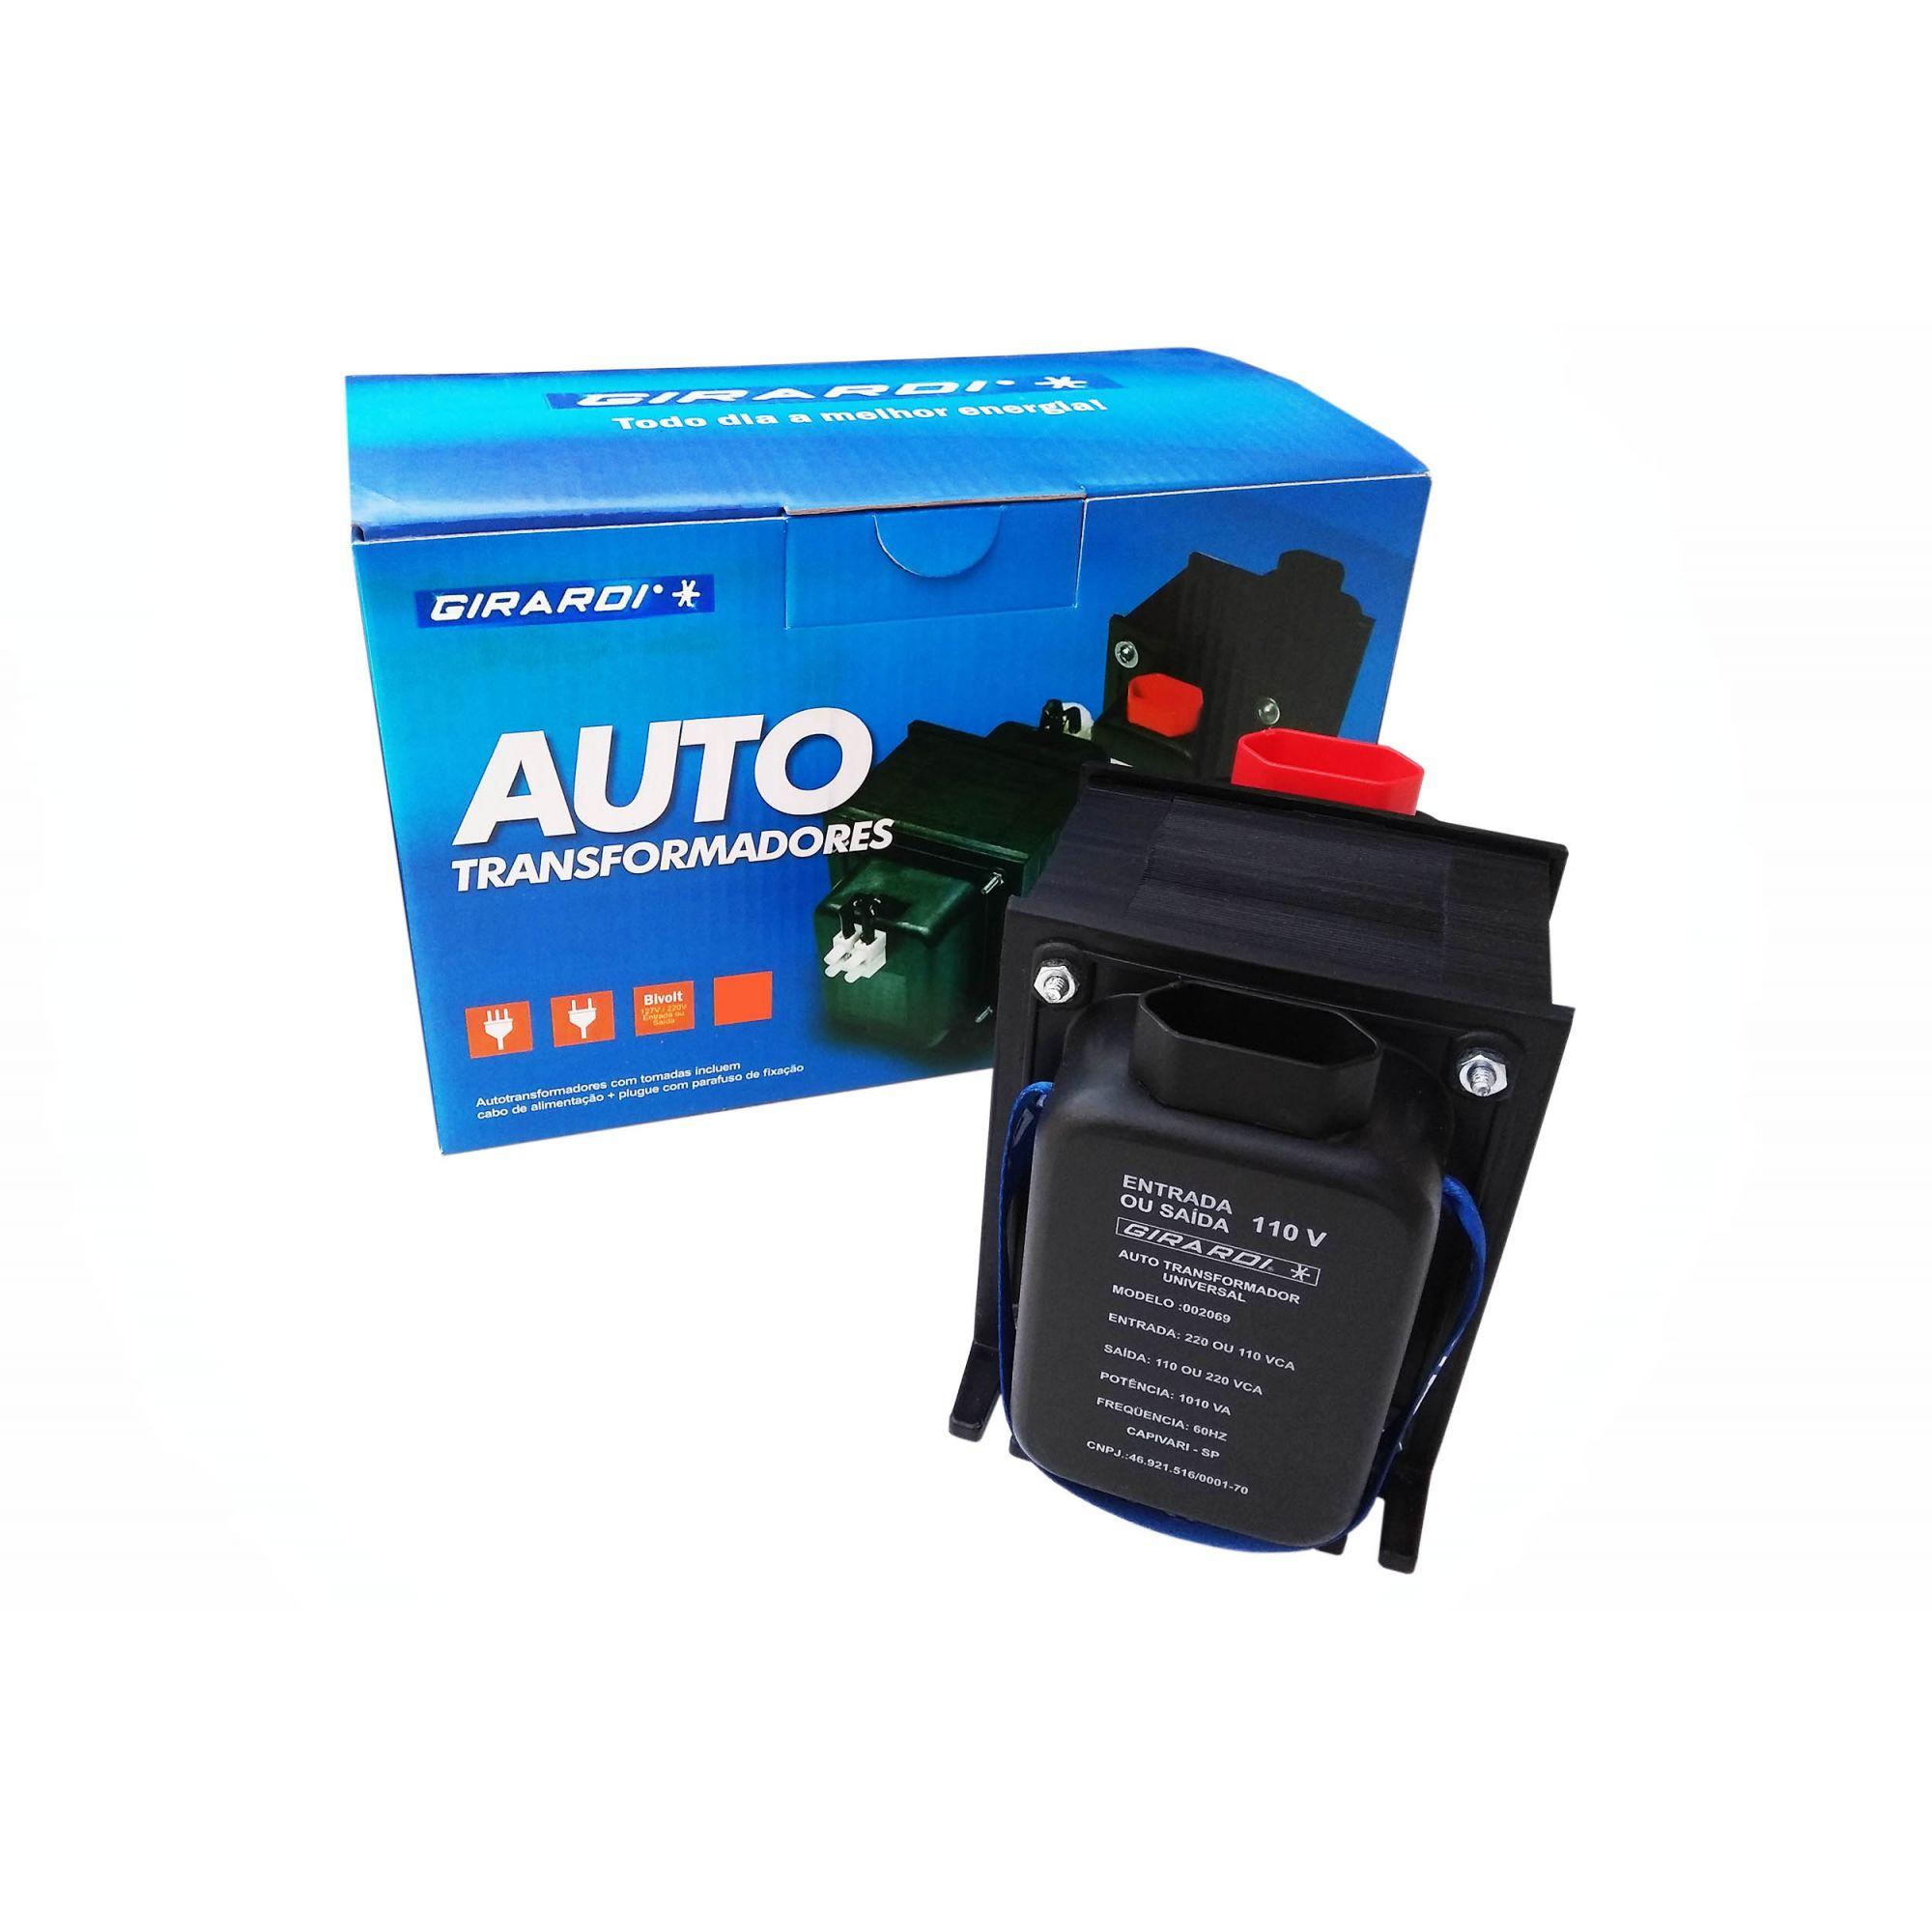 Autotransformador 1010 VA Profissional 127 / 220 V e 220 / 127 V GIRARDI